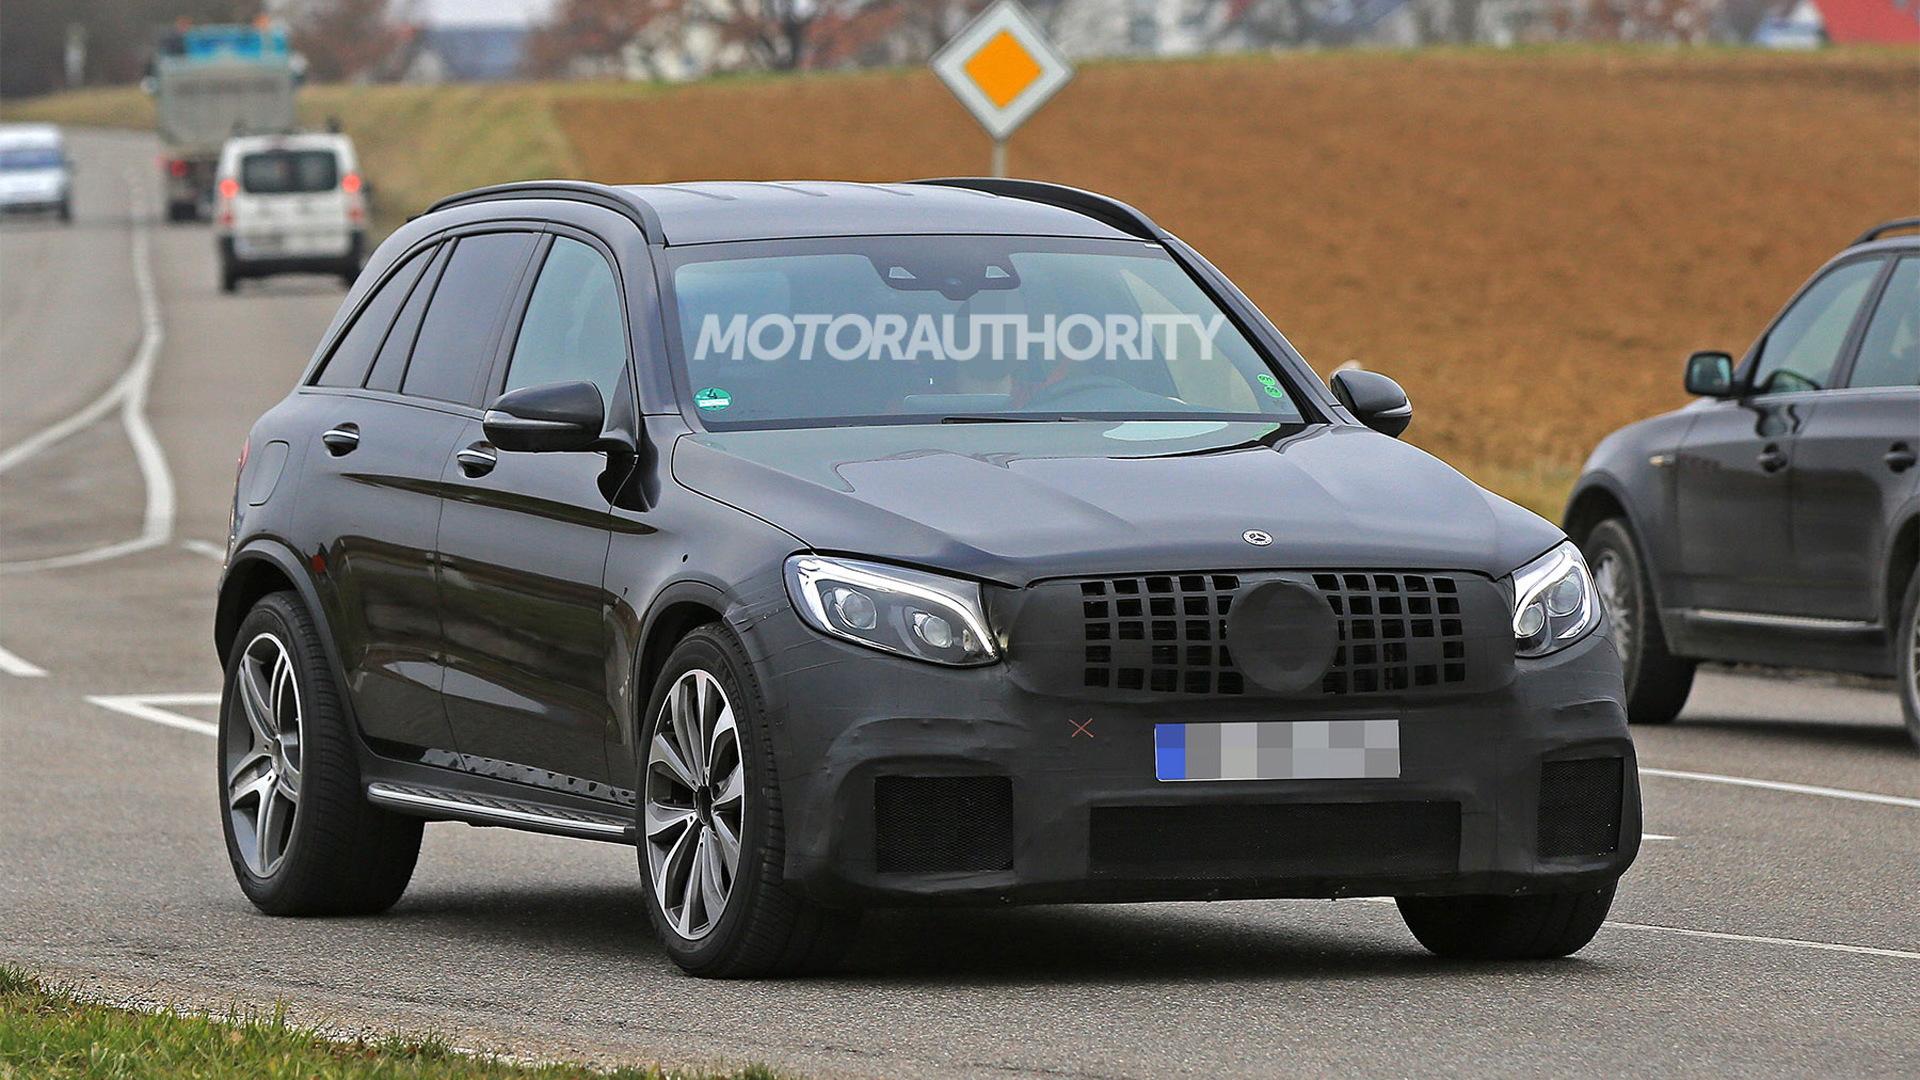 2018 Mercedes-AMG GLC63 spy shots - Image via S. Baldauf/SB-Medien